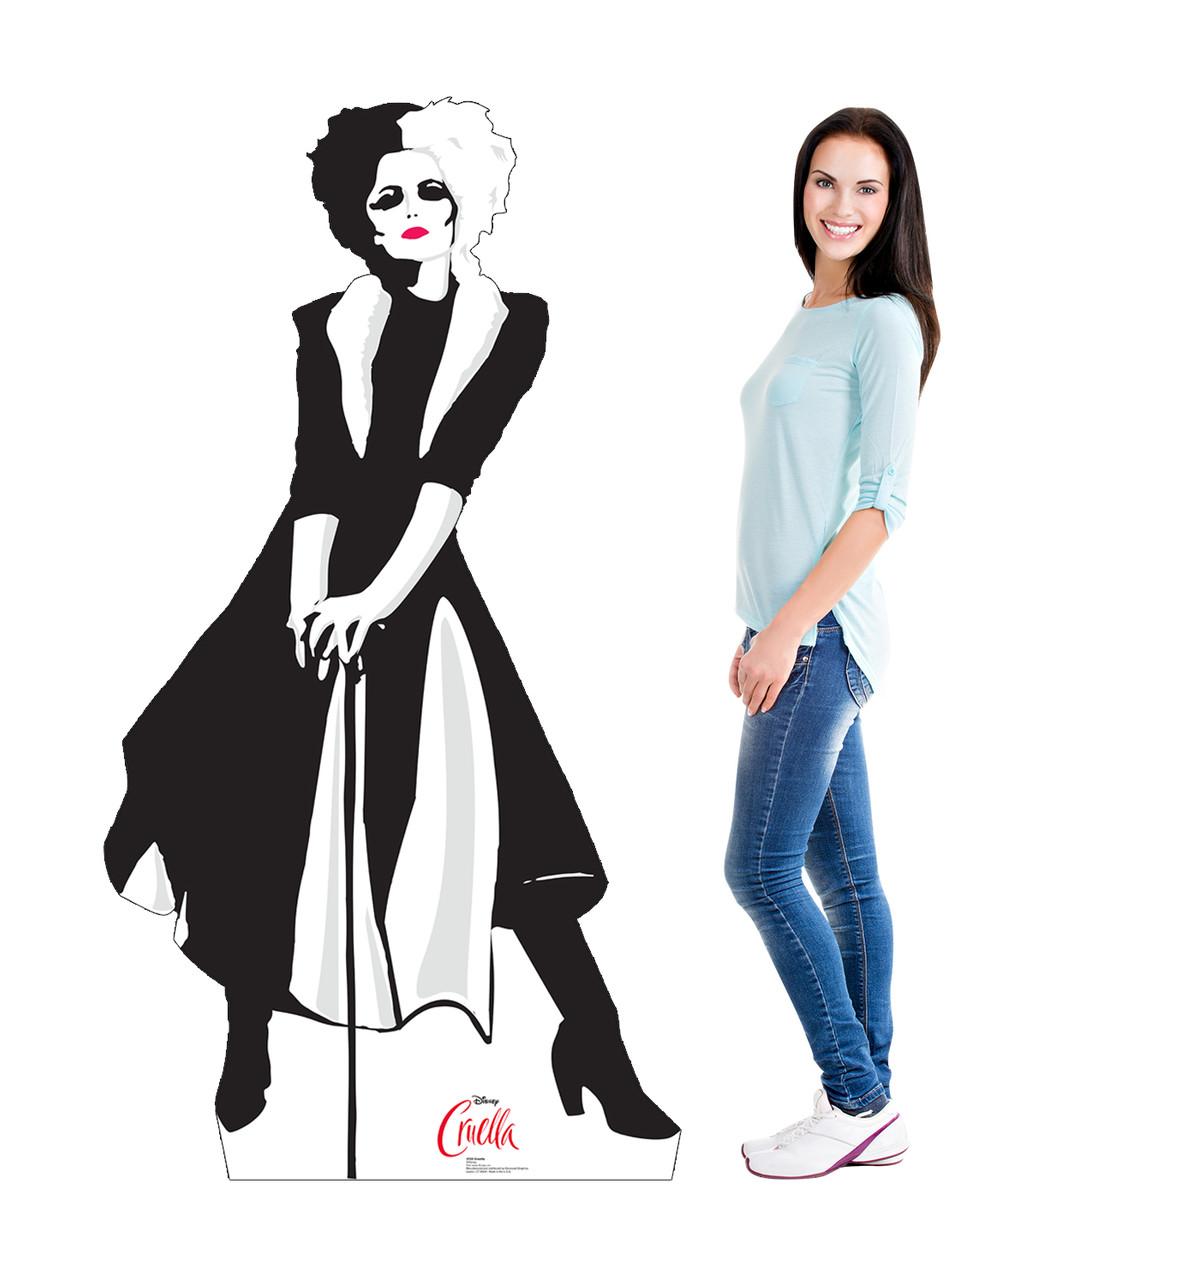 Life-size cardboard standee of Cruella from Disney+ movie Cruella with model.